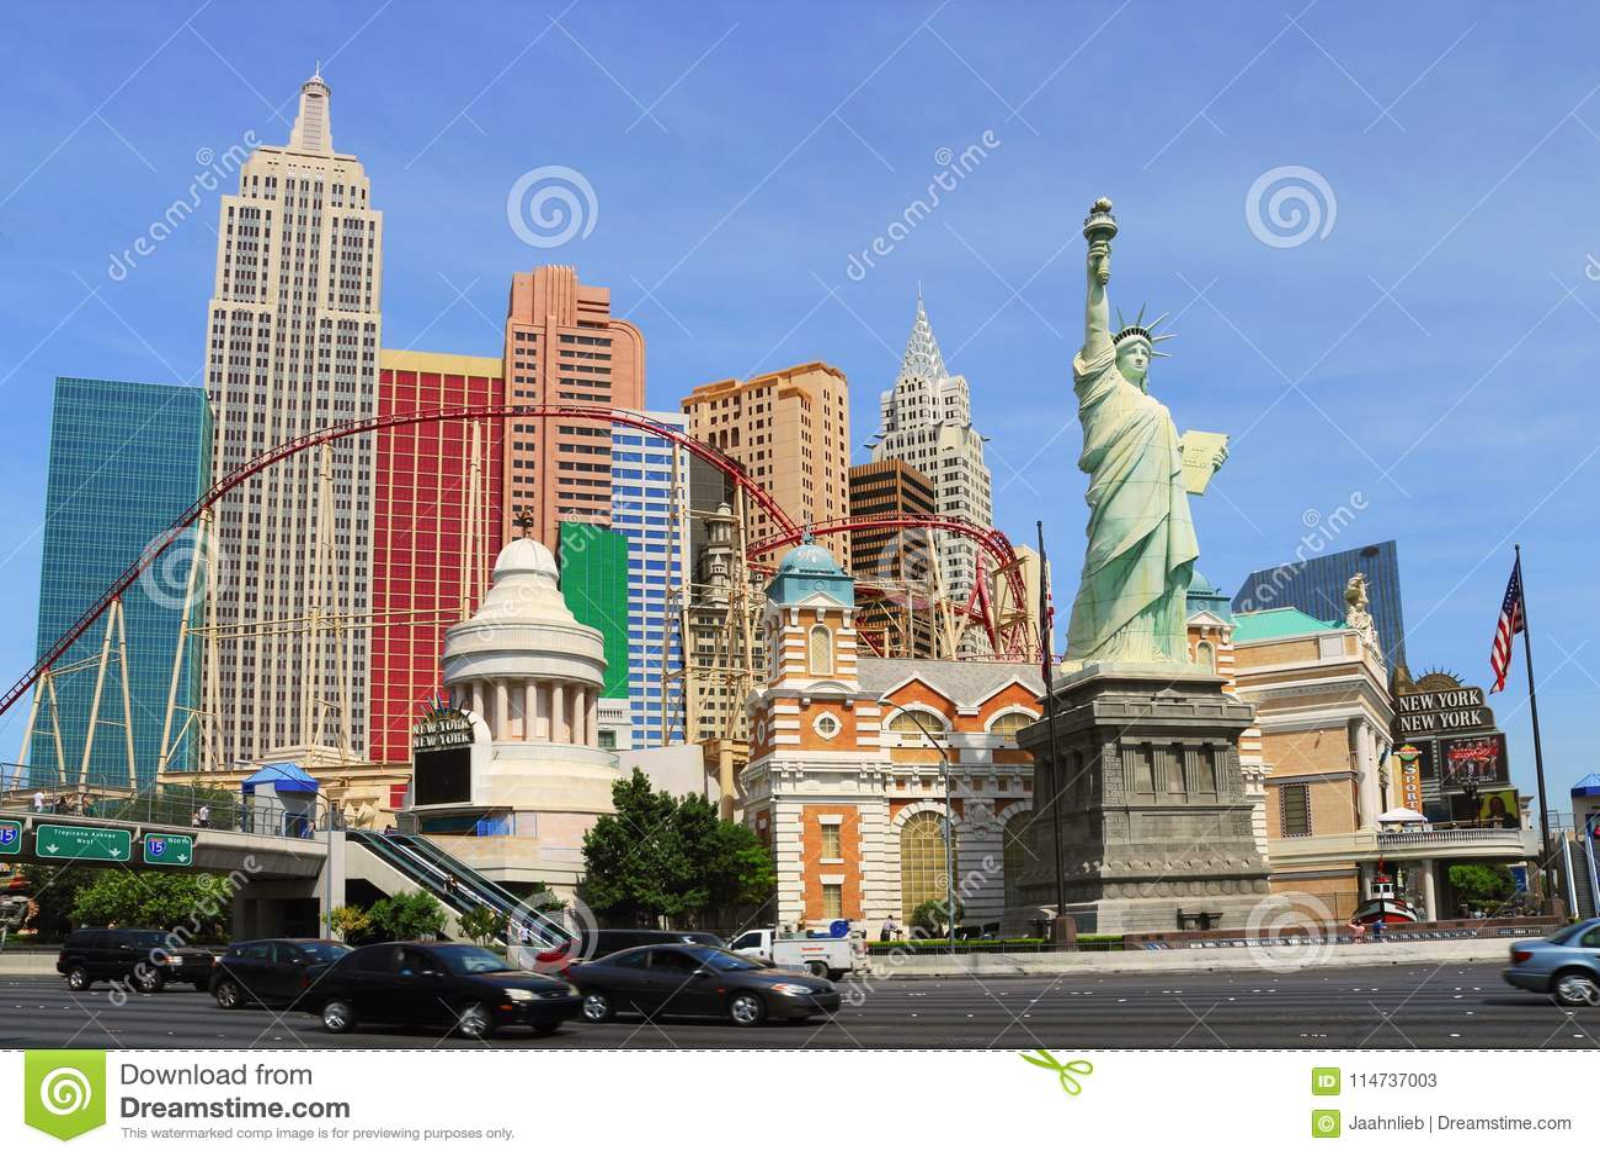 The Imposing New York New York Hotel And Casino In Las Vegas Nevada